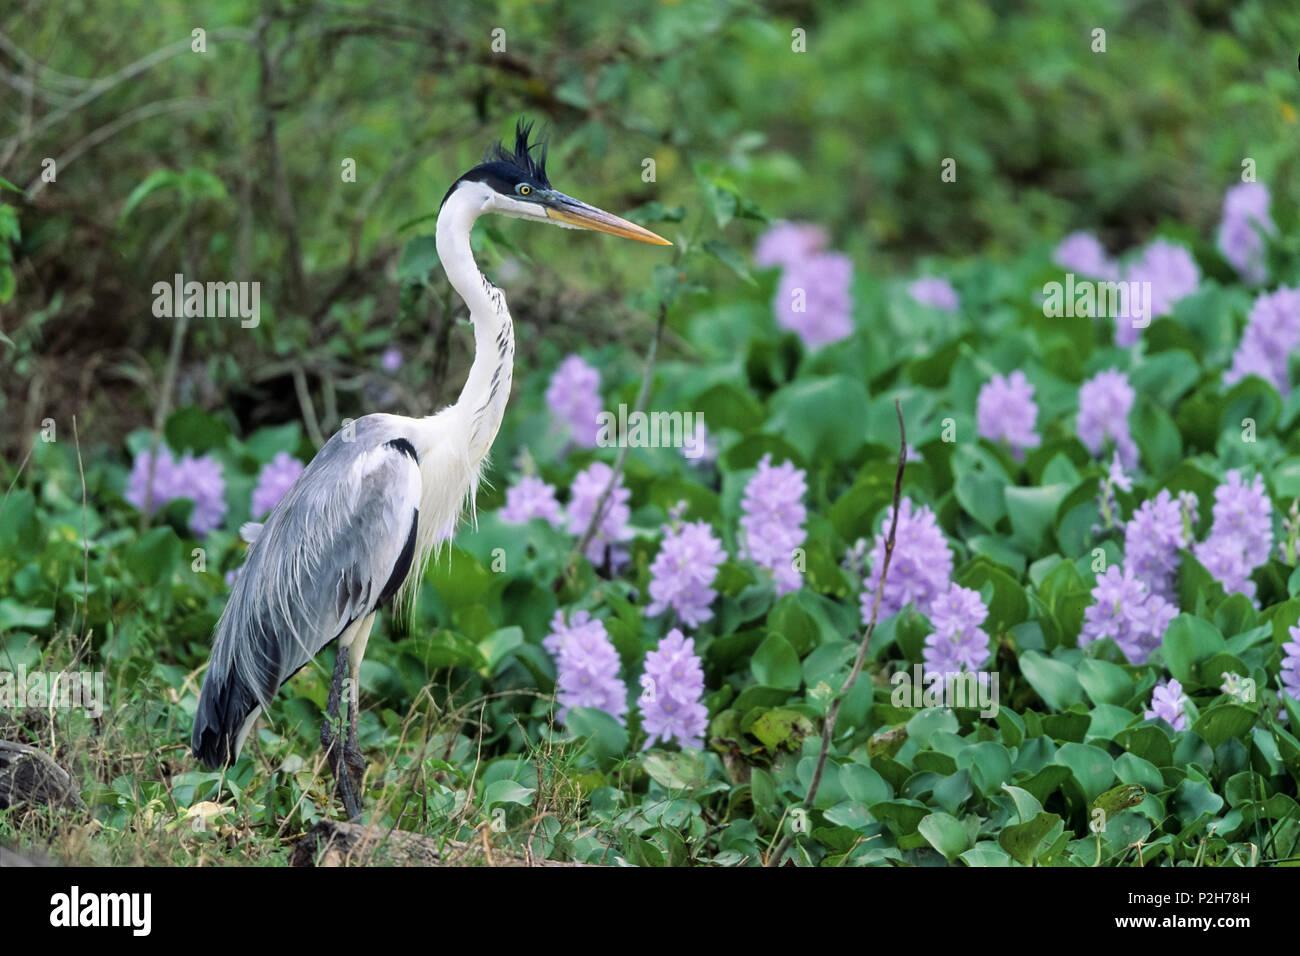 White-necked Heron, Ardea cocoi, Pantanal, Brasil, South America - Stock Image